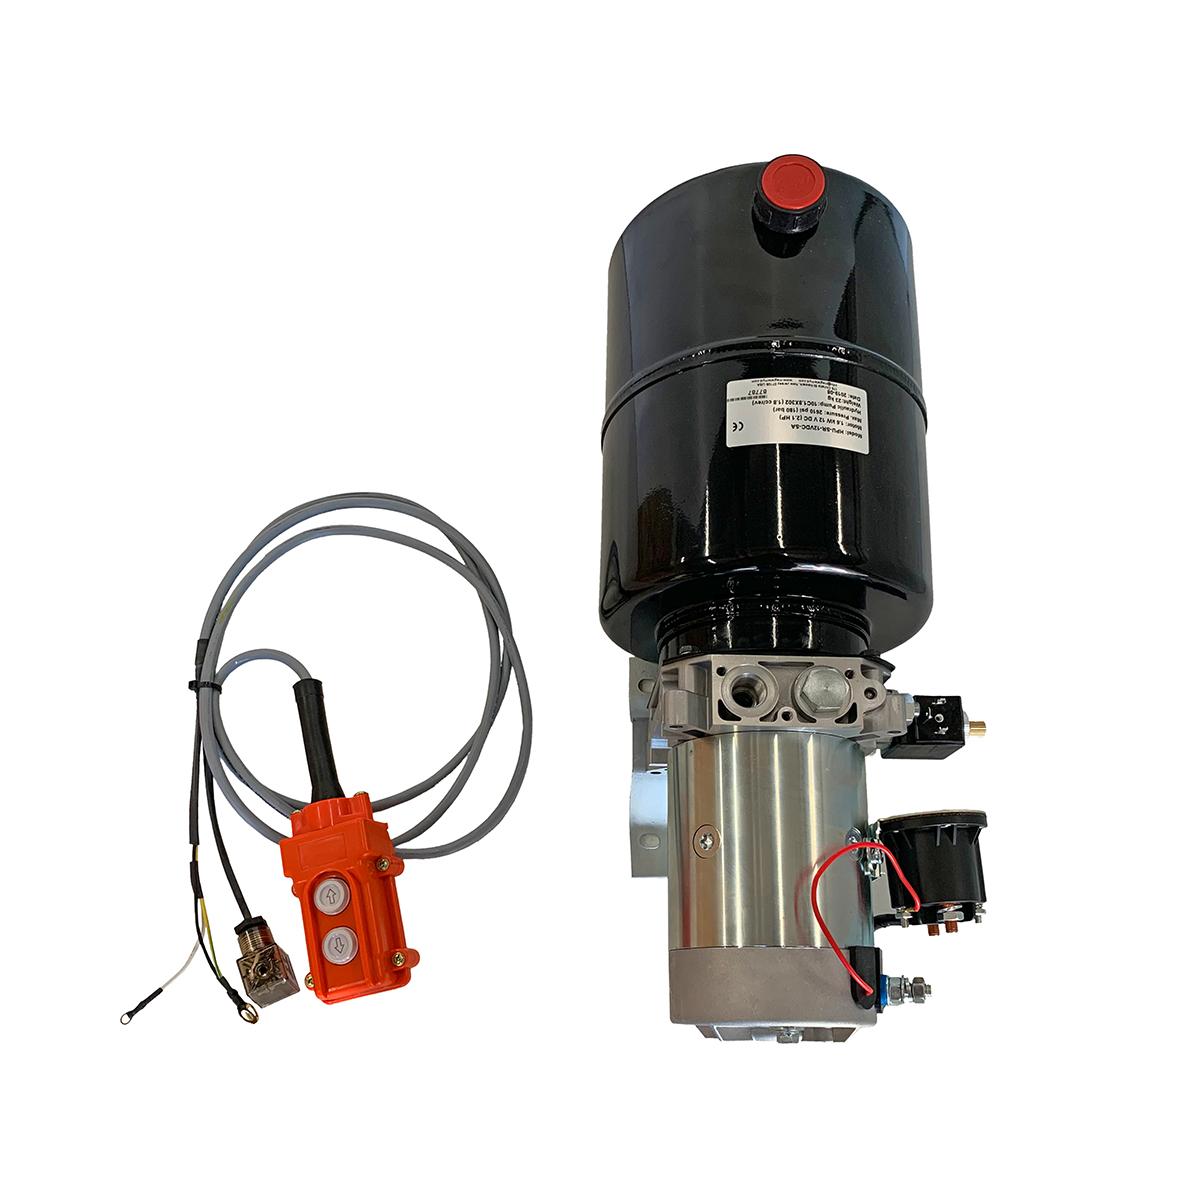 single acting 12 quarts hydraulic power unit 12V DC by Hydro-Pack